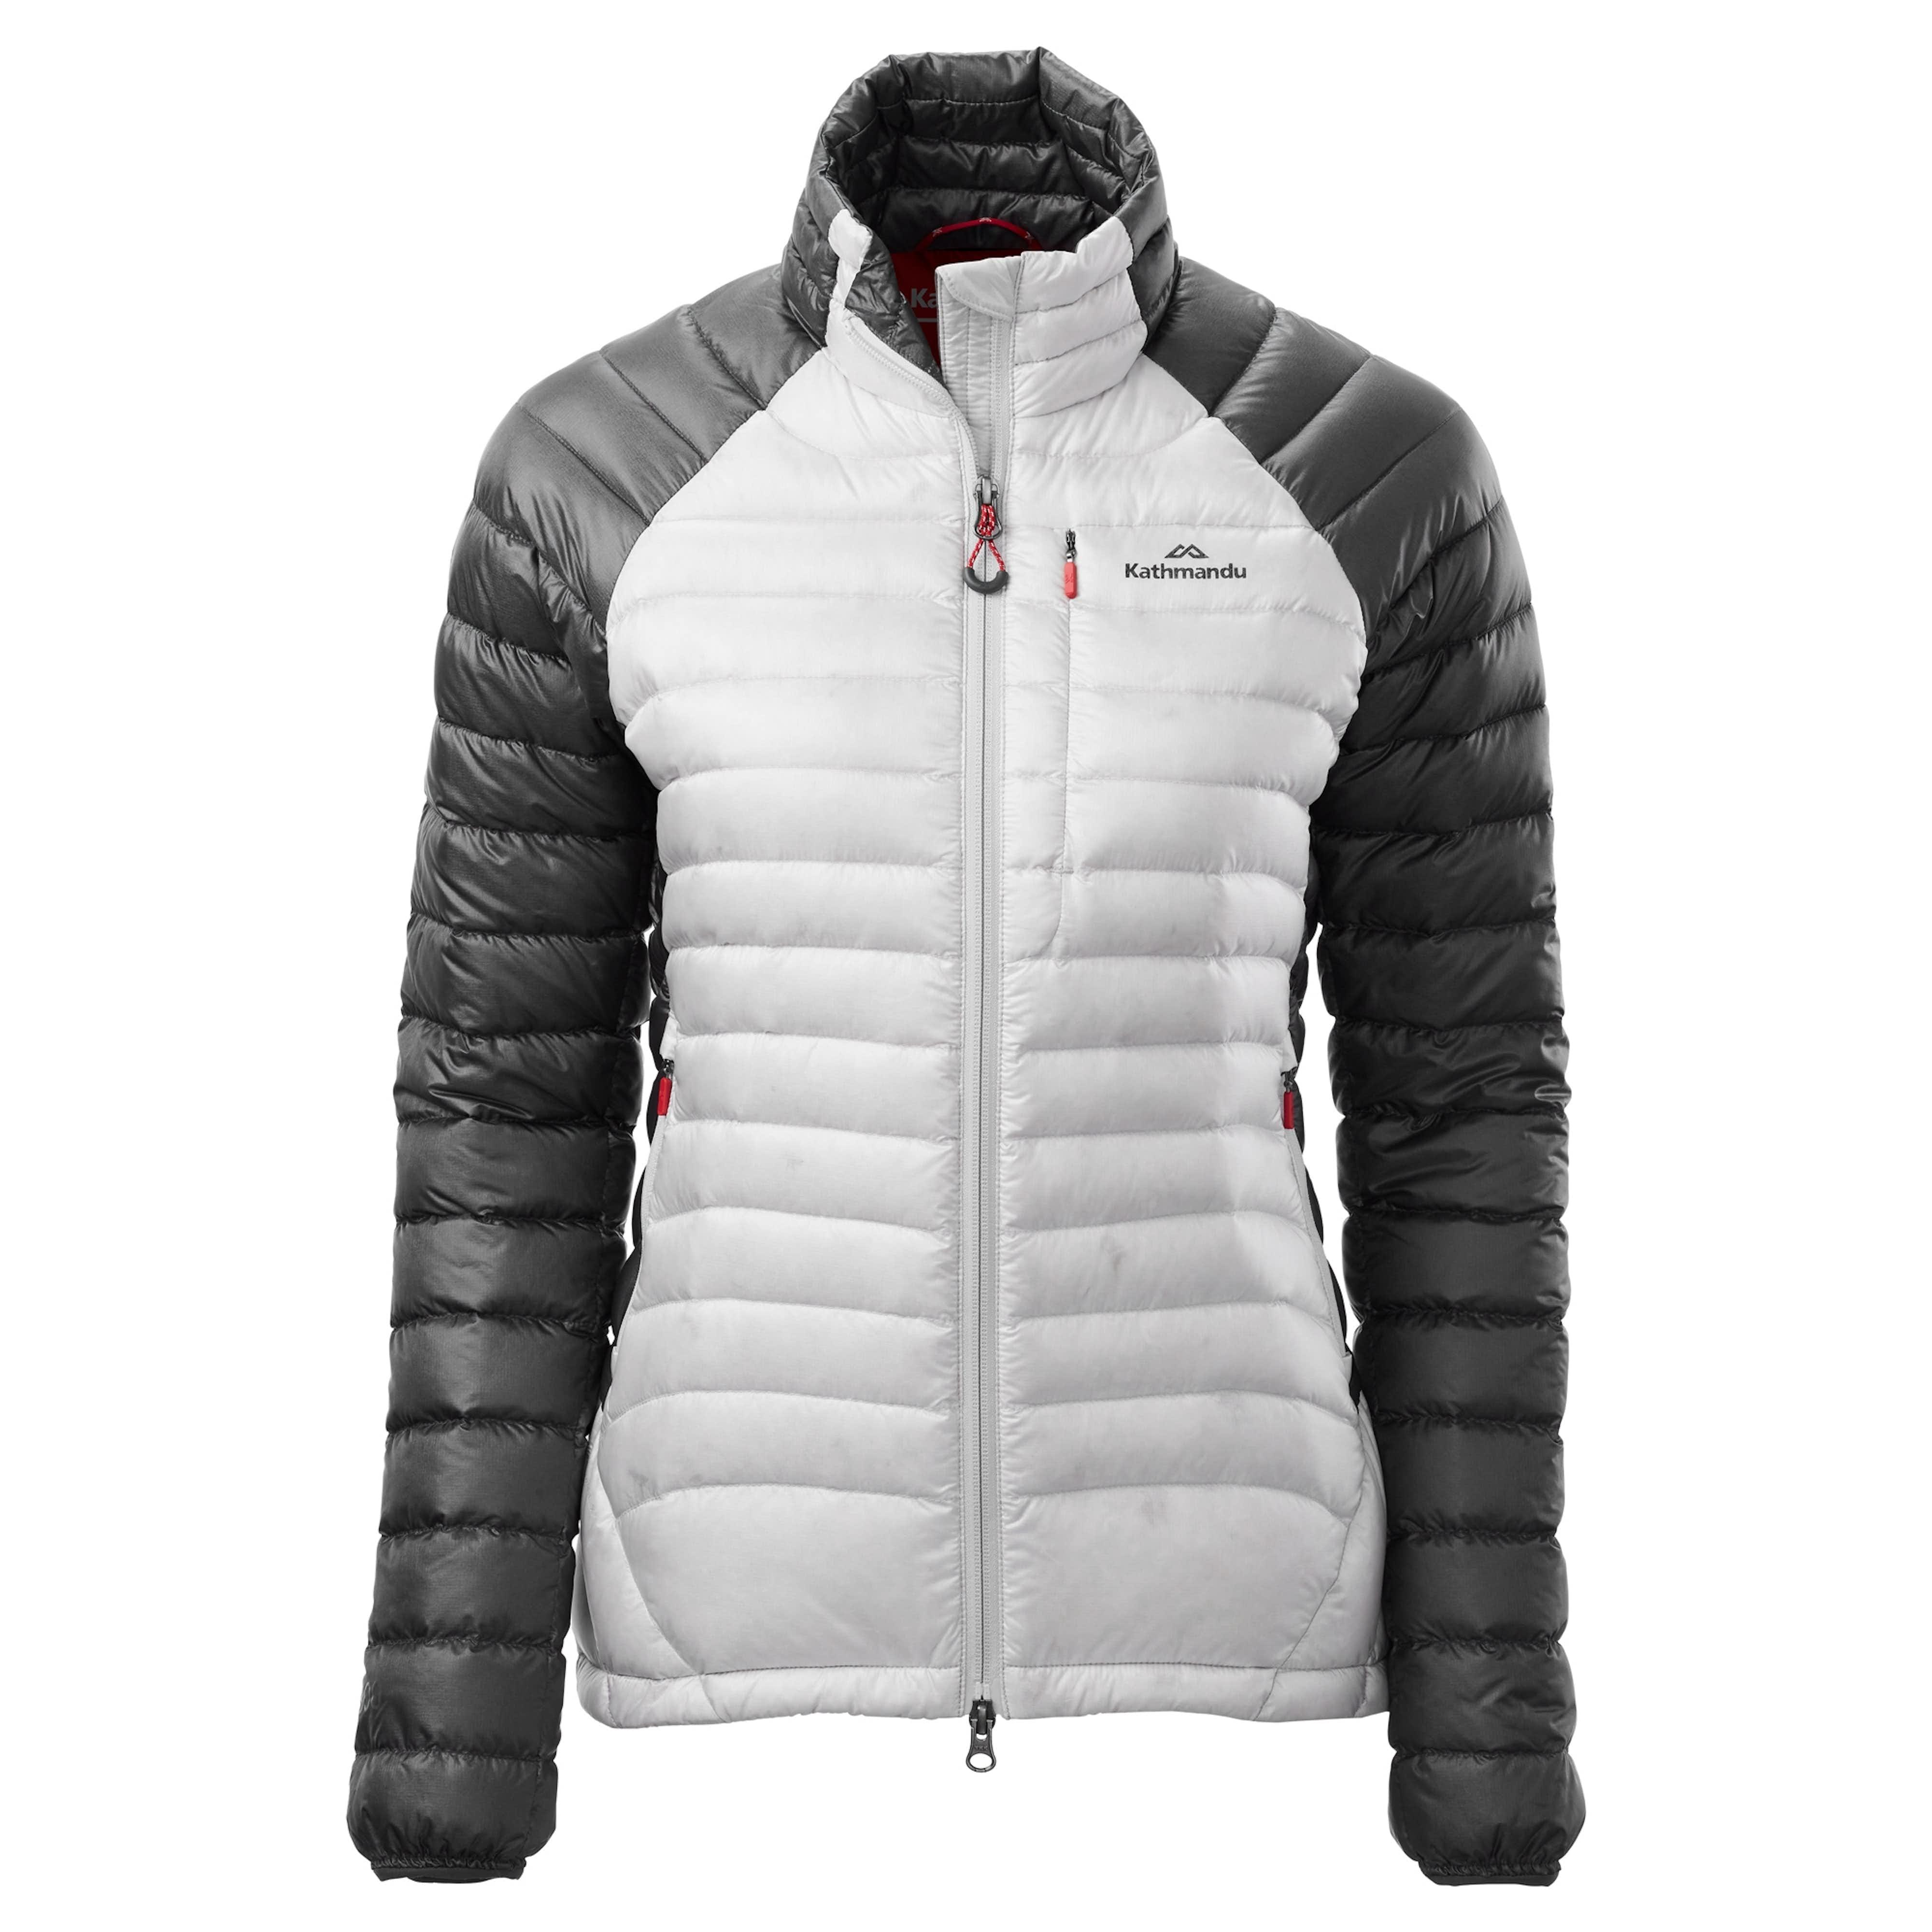 de65504a37f7 XT Ultralight Women s Down Jacket